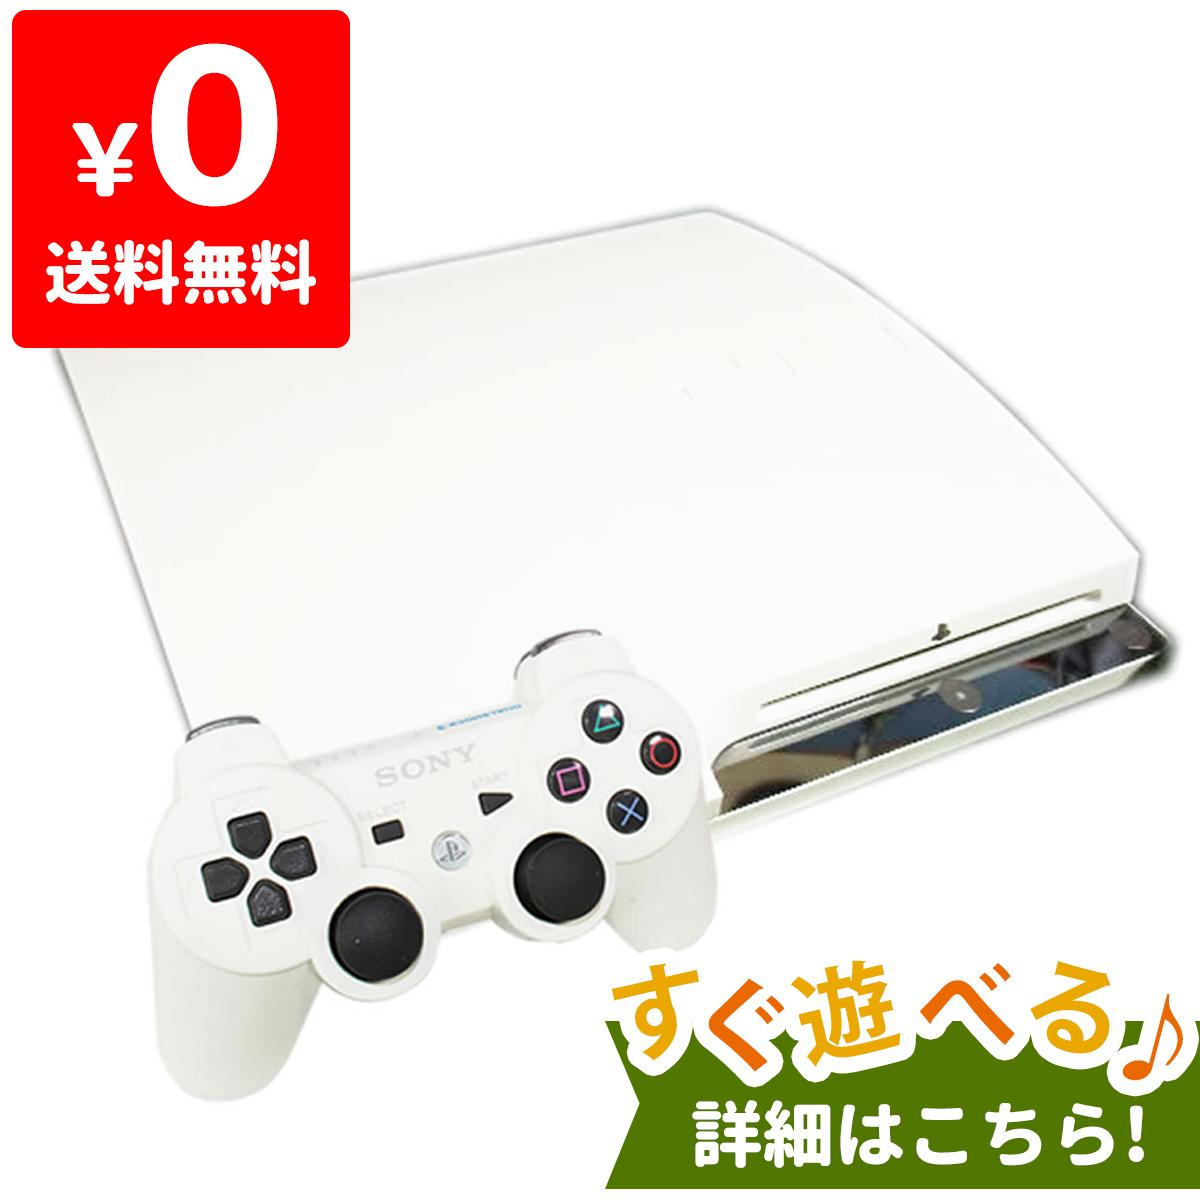 PS3 プレステ3 PlayStation 3 (160GB) クラシック・ホワイト (CECH-3000A LW) SONY ゲーム機 中古 すぐ遊べるセット 4948872412865 送料無料 【中古】